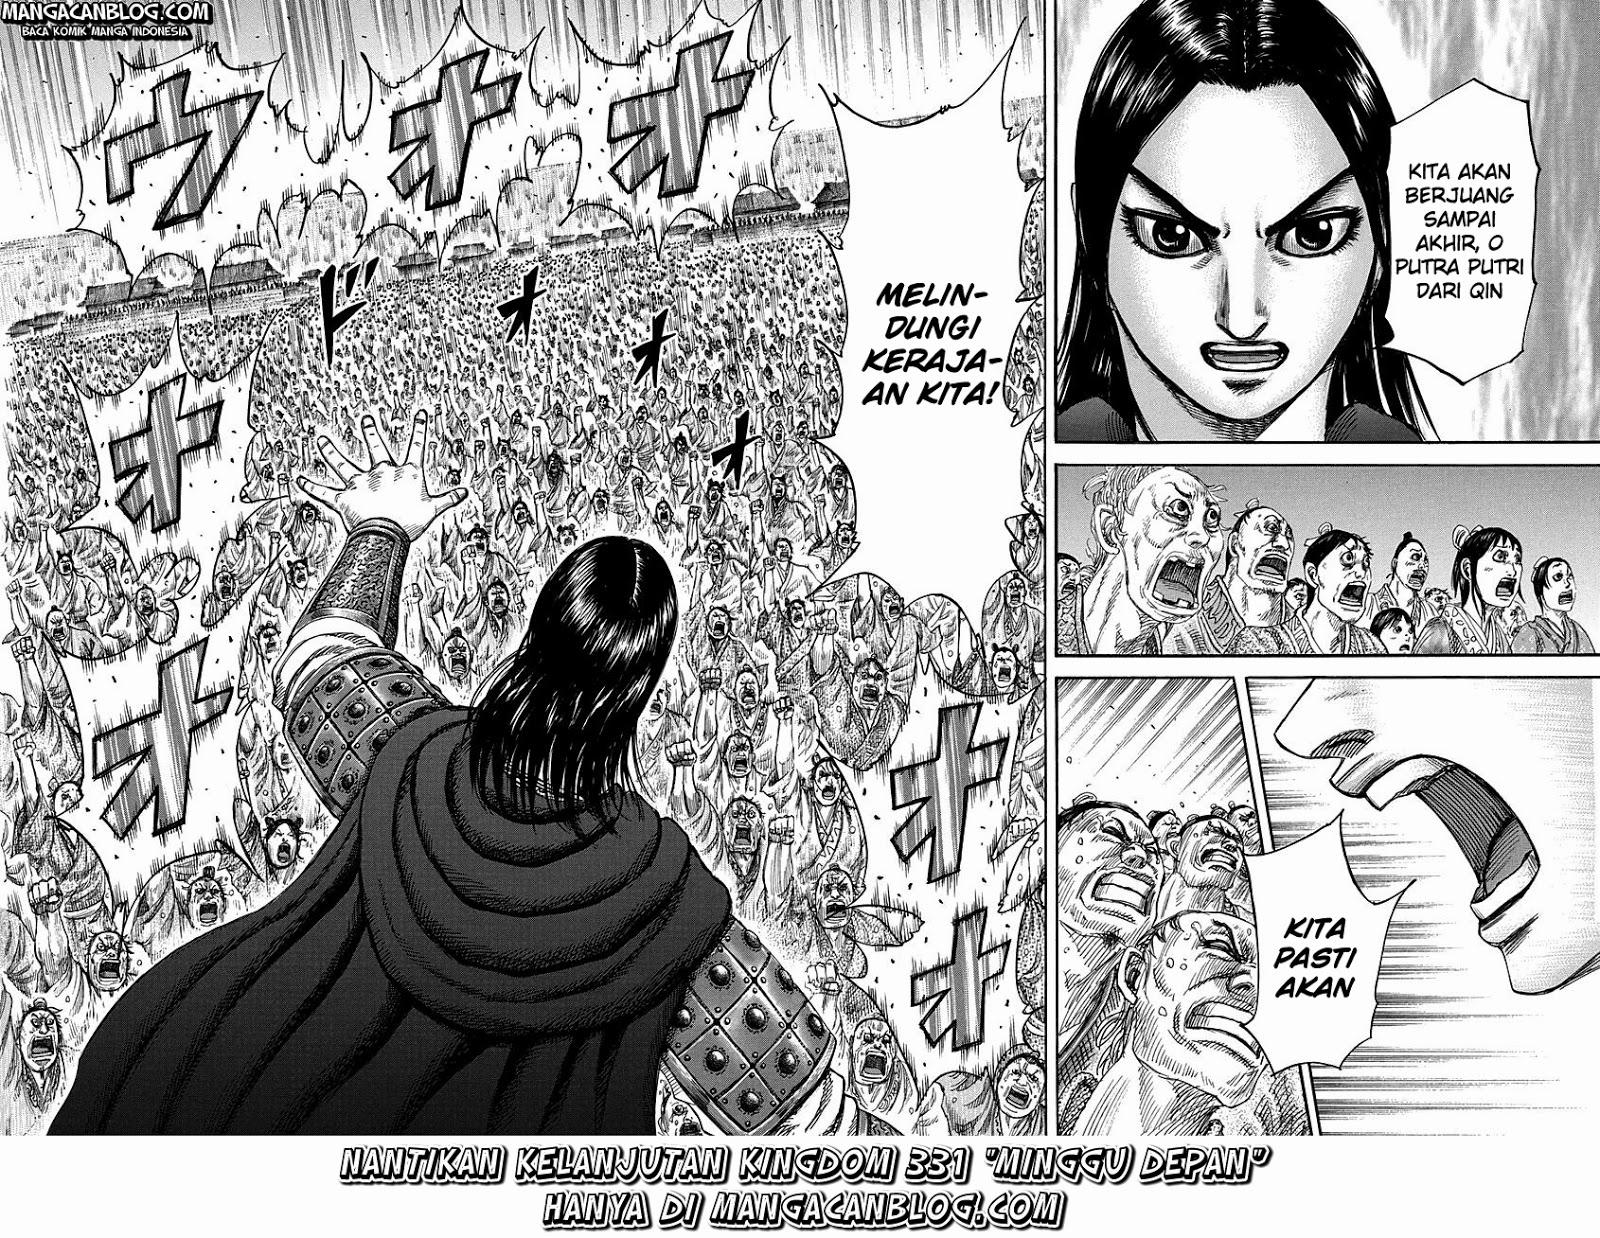 Baca Komik Manga Kingdom Chapter 330 Komik Station